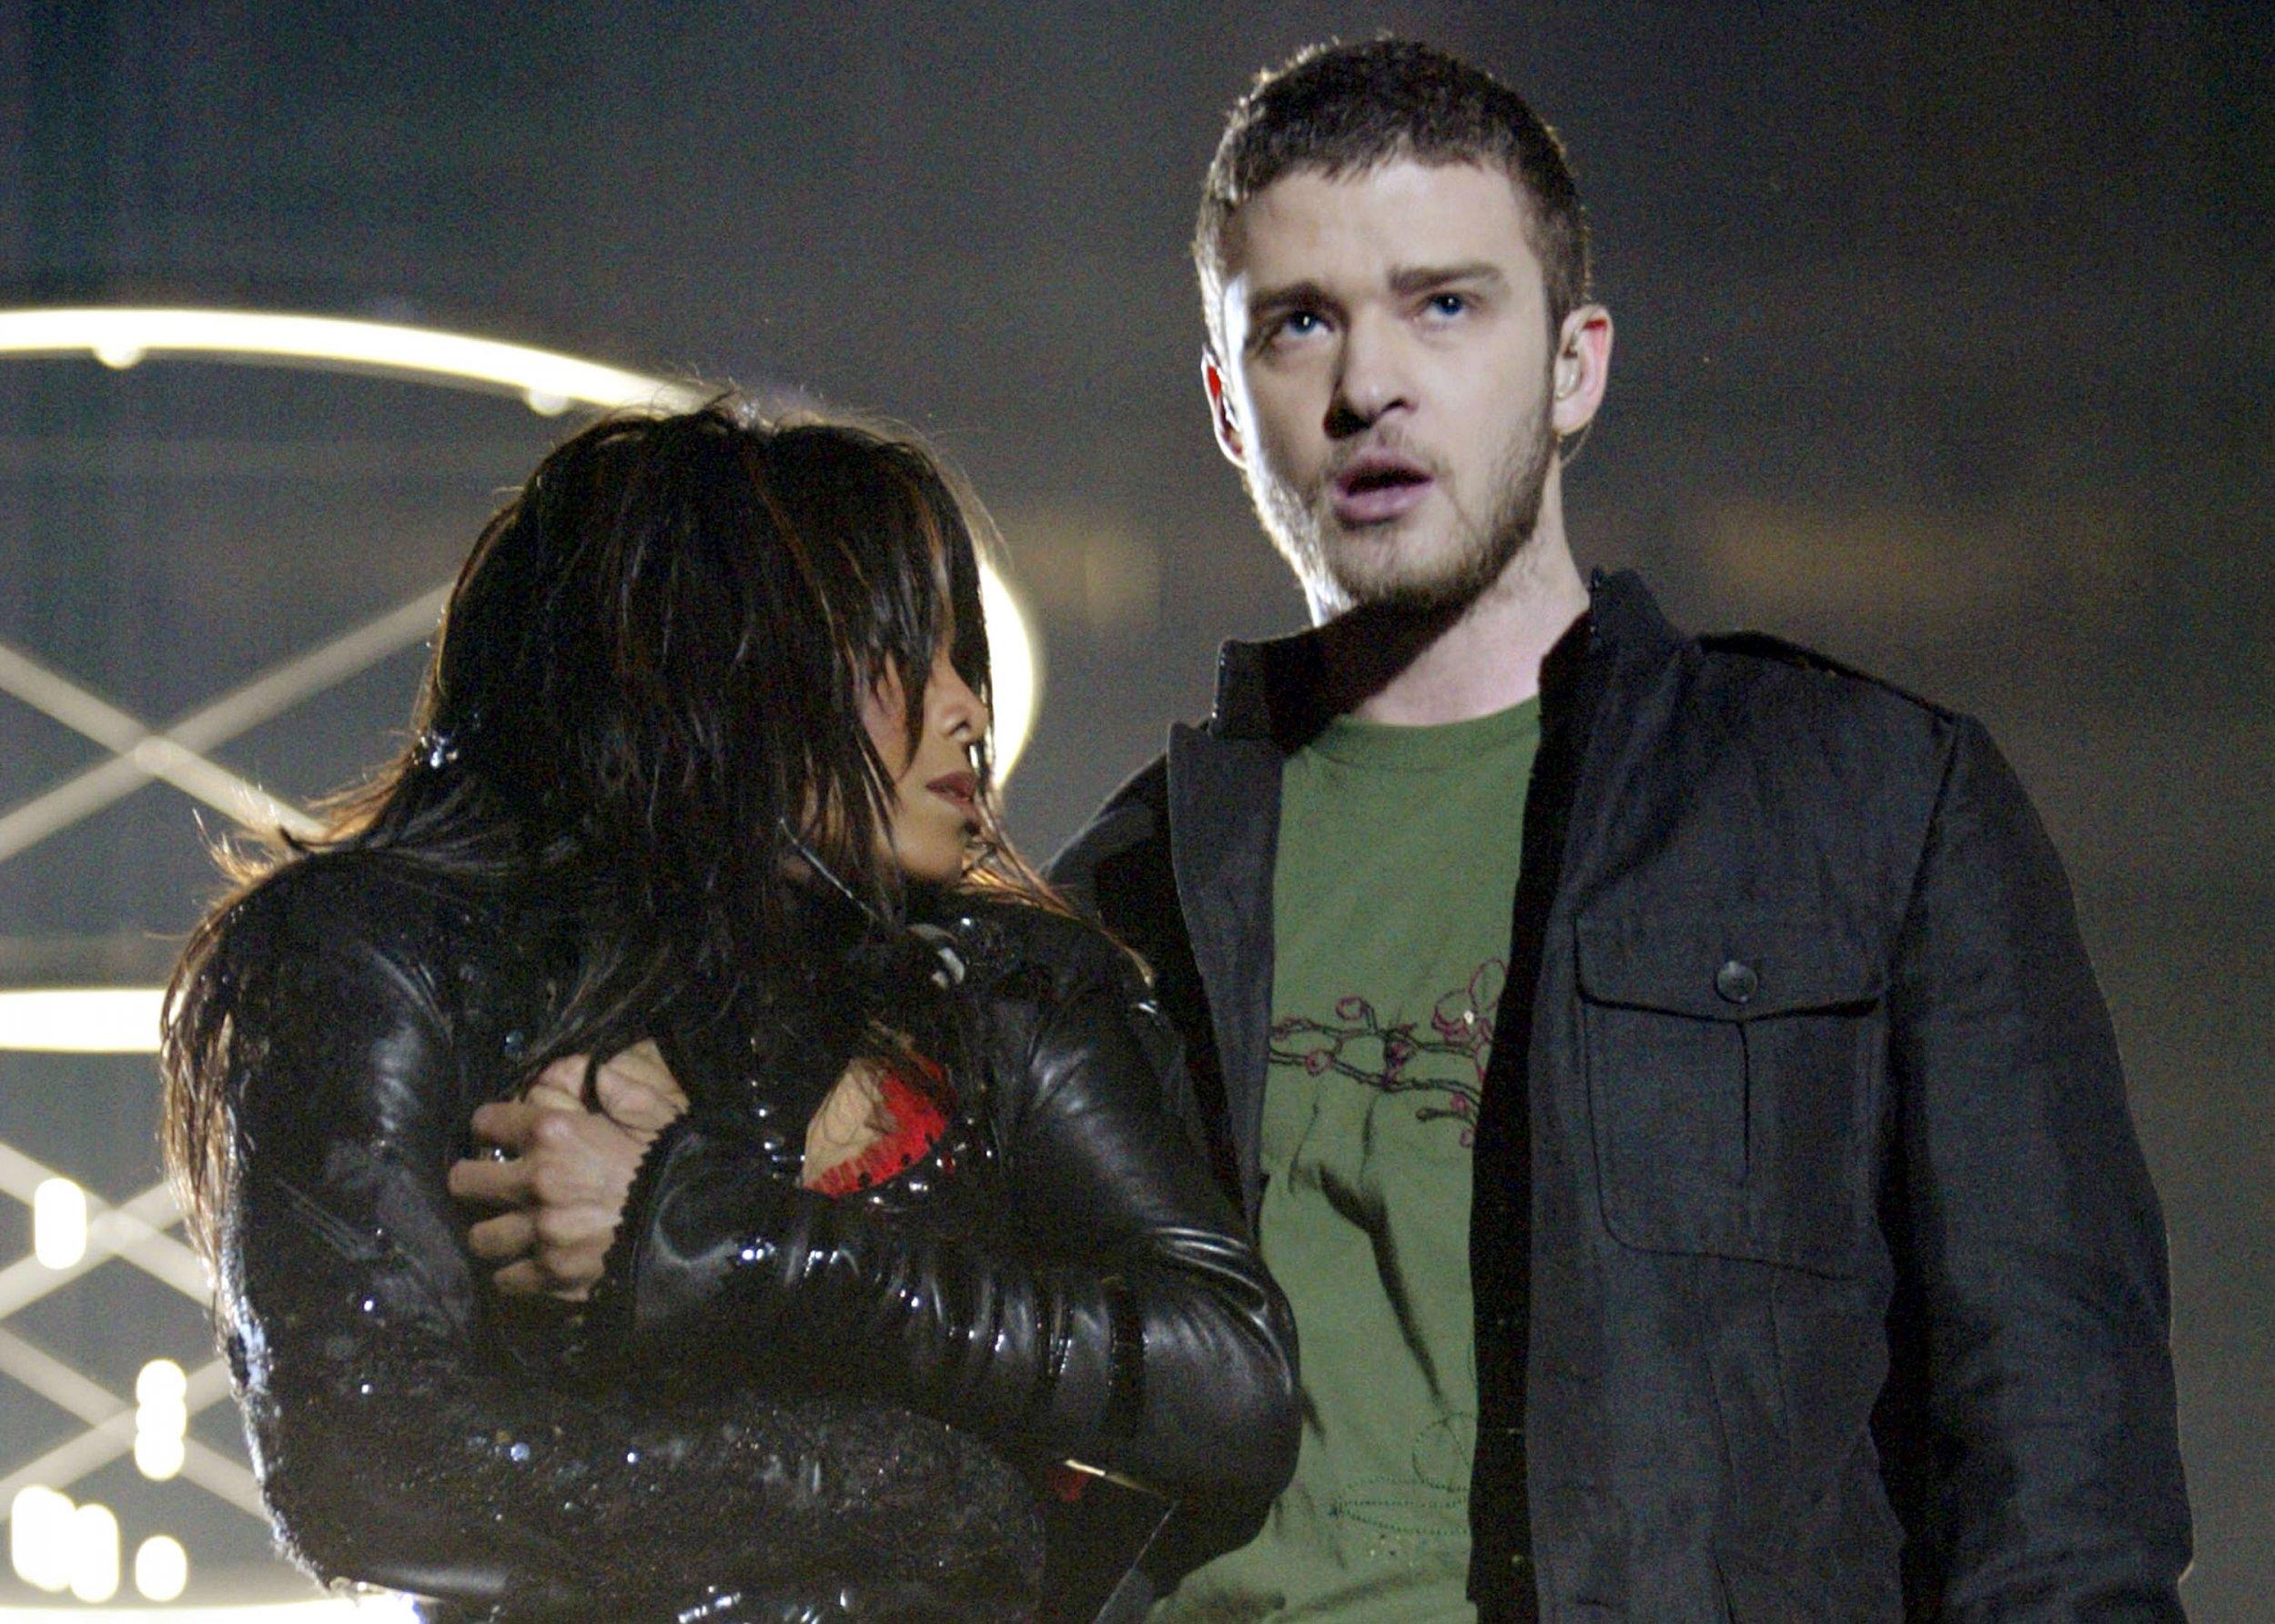 Janet Jackson and Justin Timberlake at 2004 Super Bowl